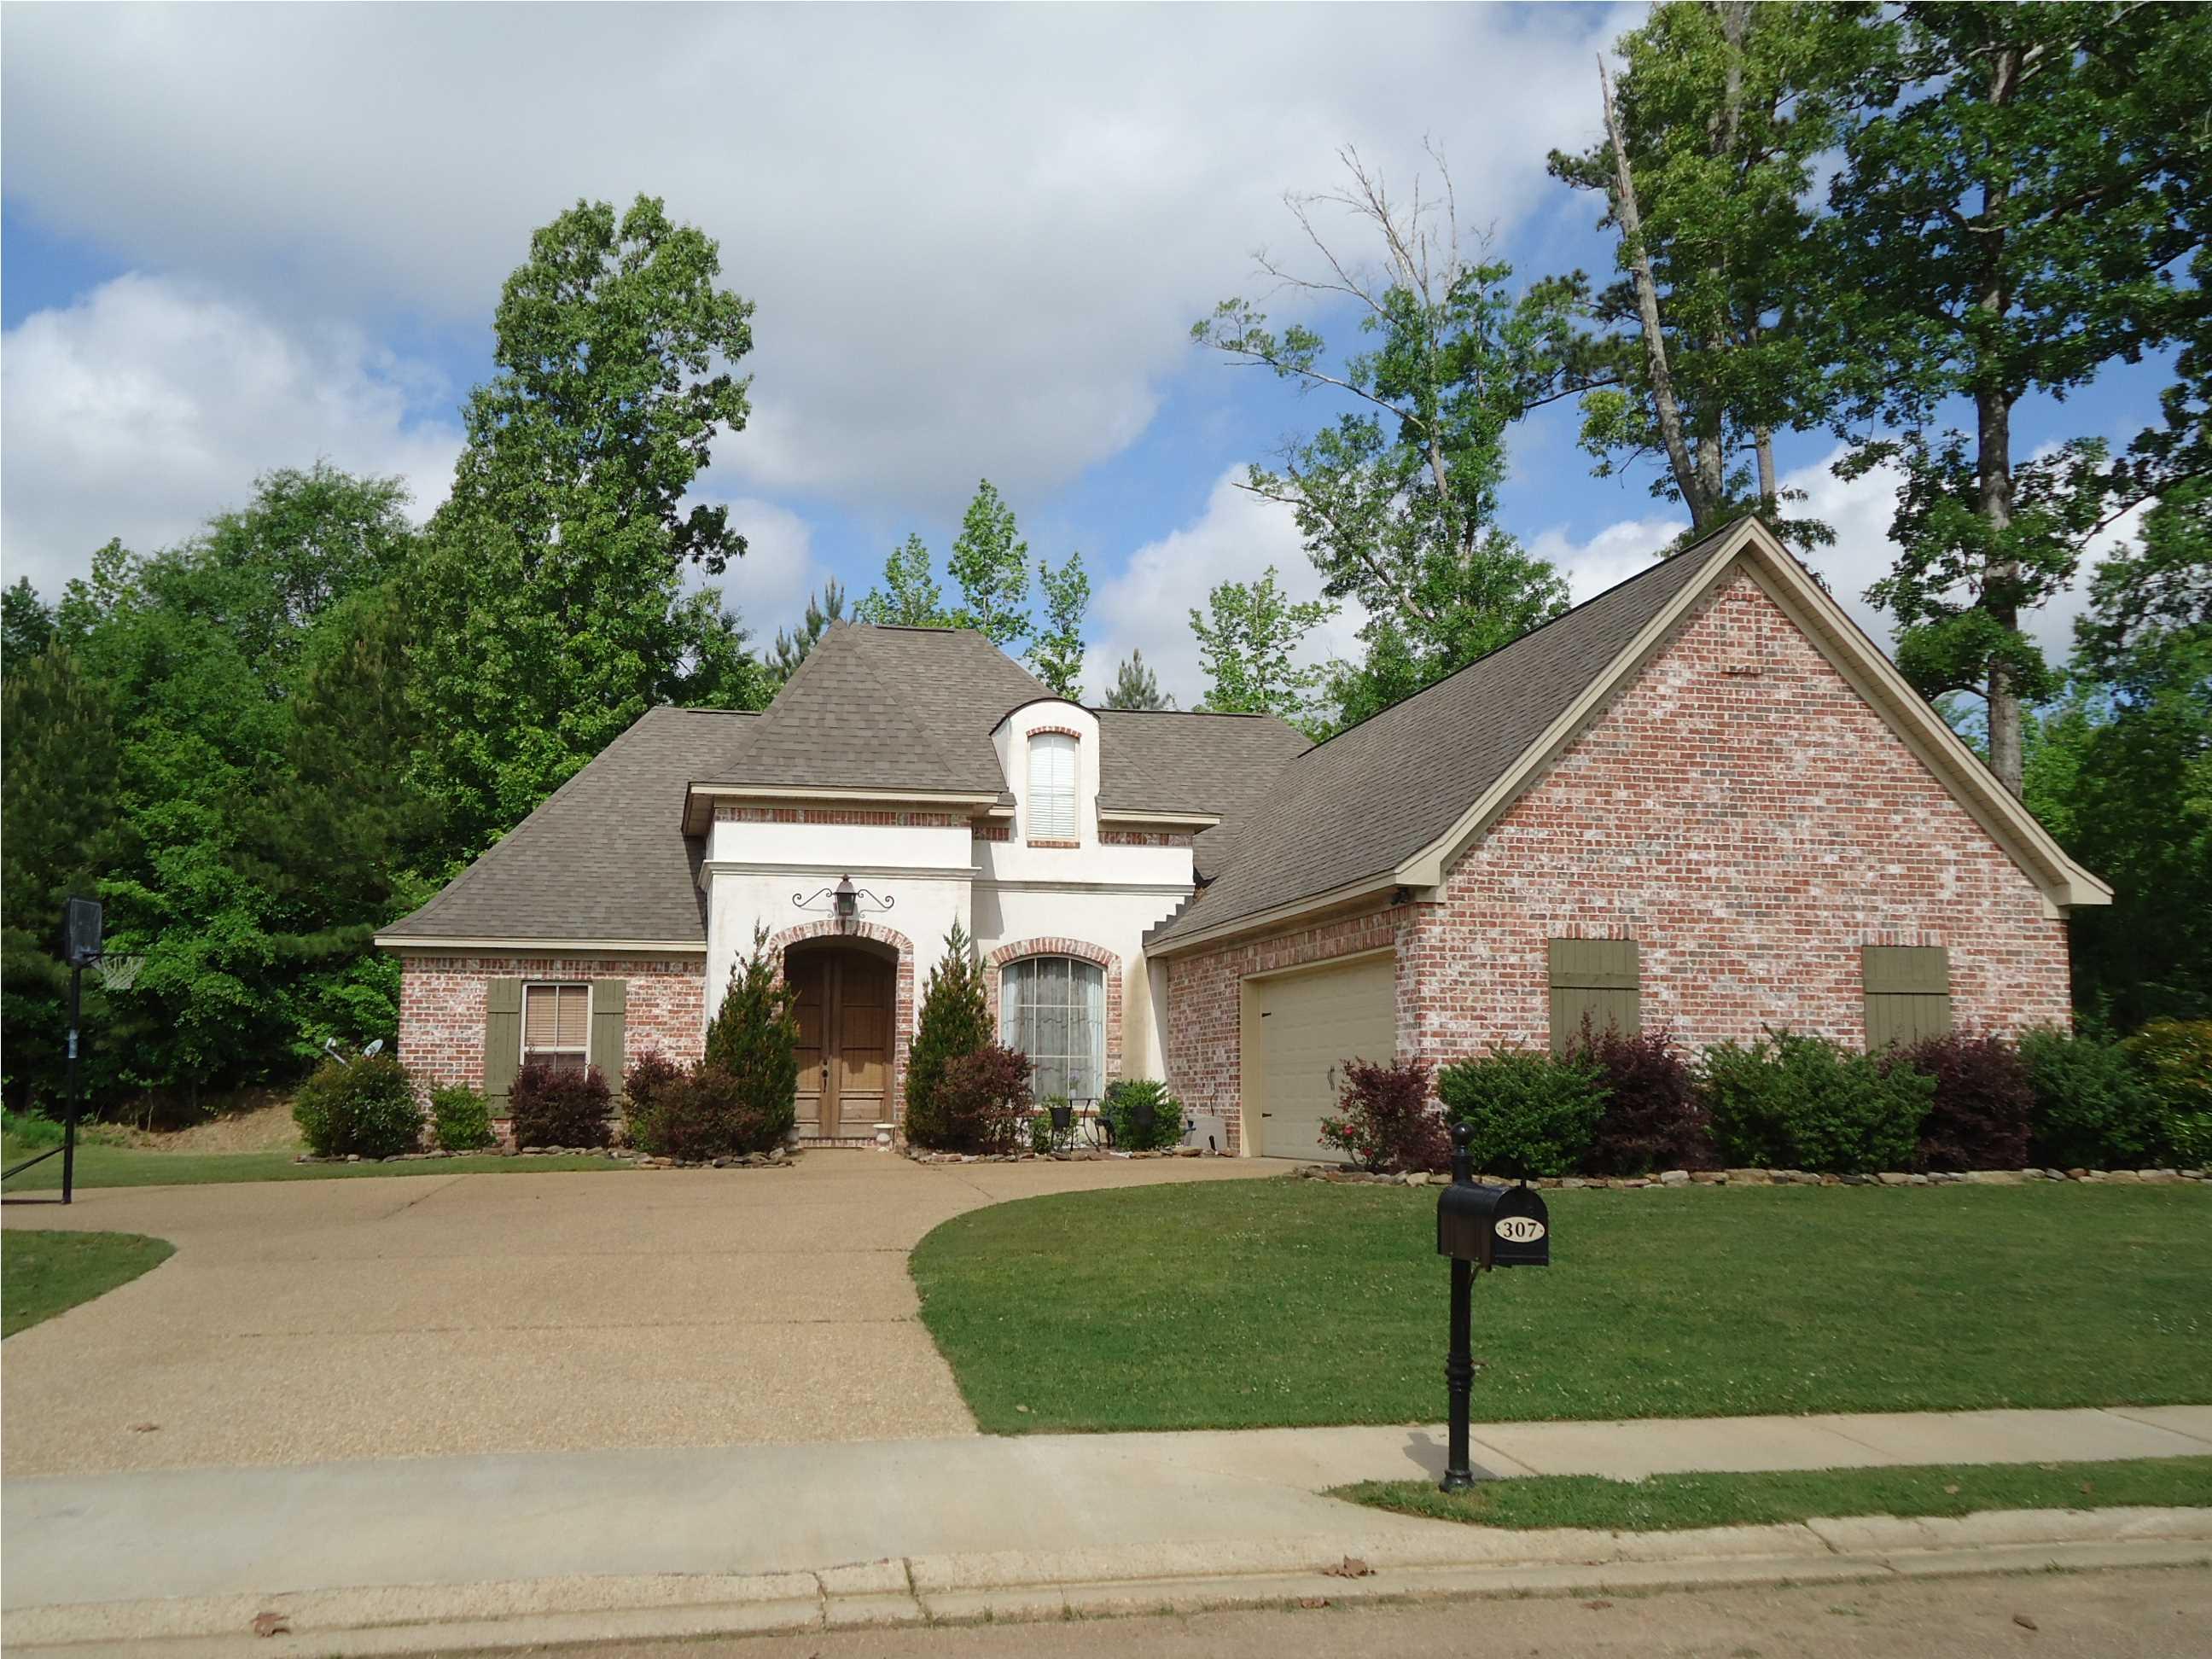 Real Estate for Sale, ListingId: 28020441, Brandon,MS39042